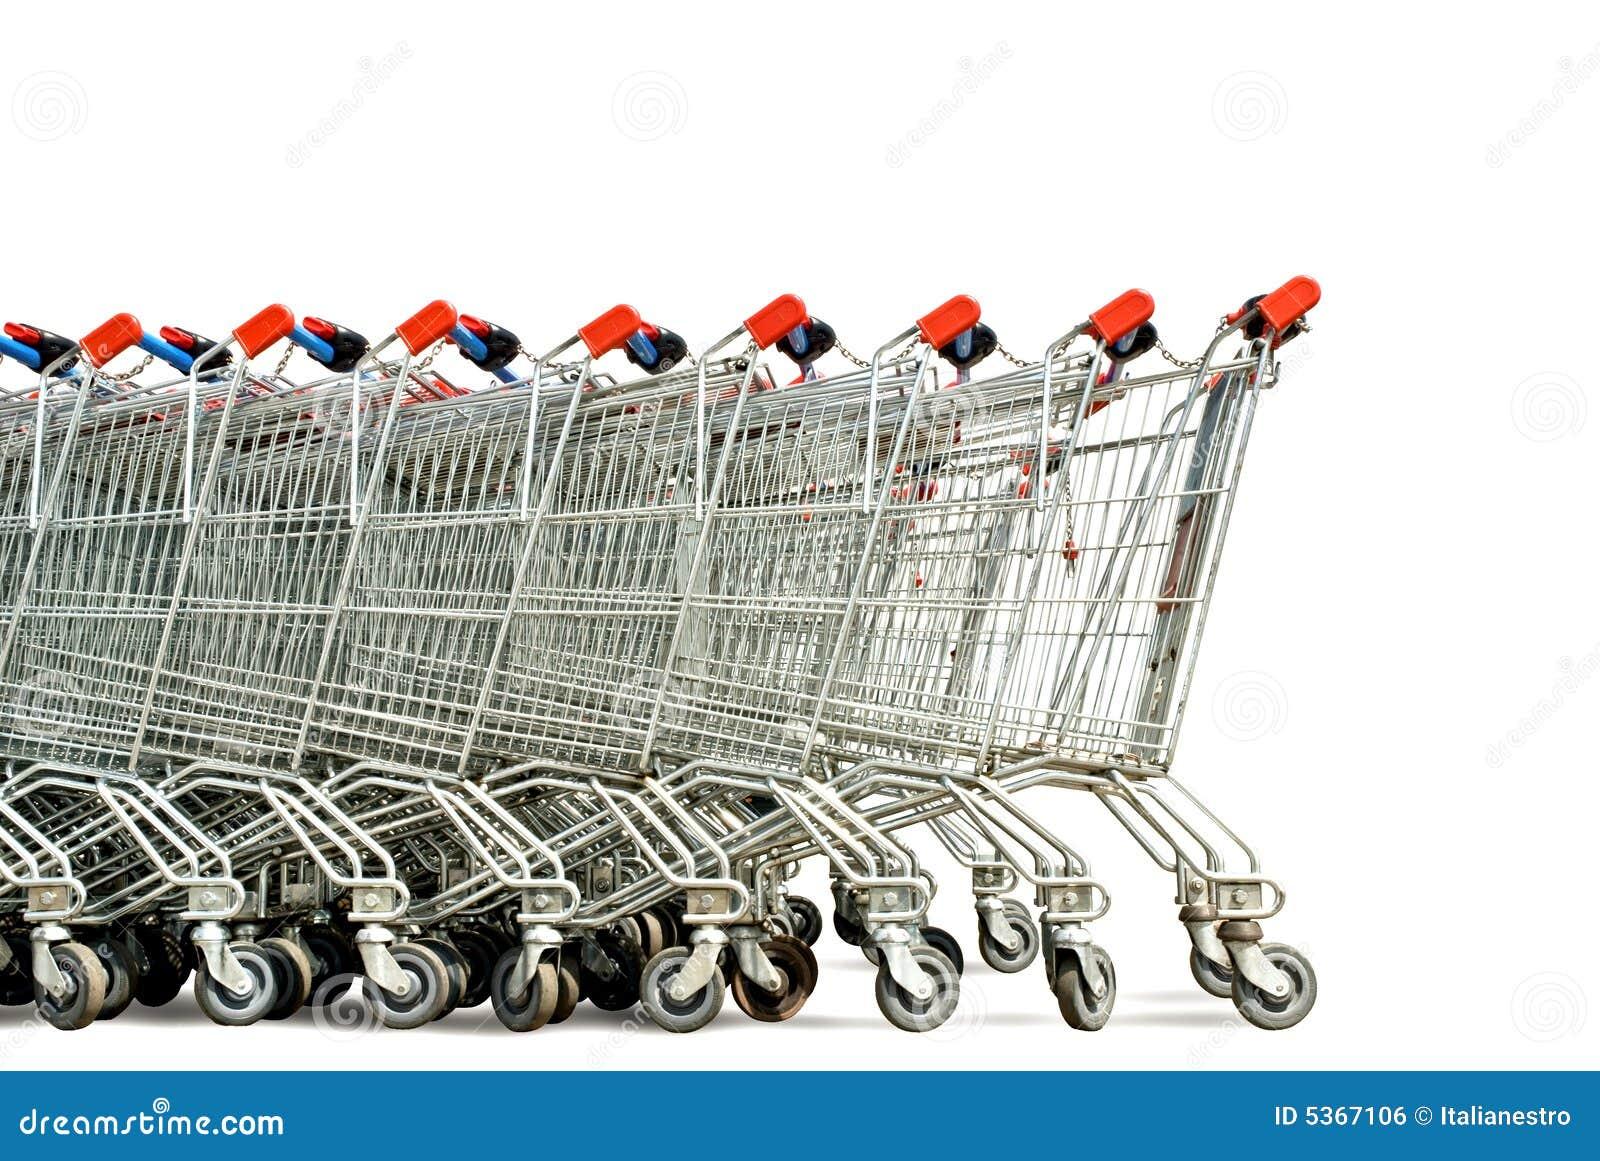 Carros de compra